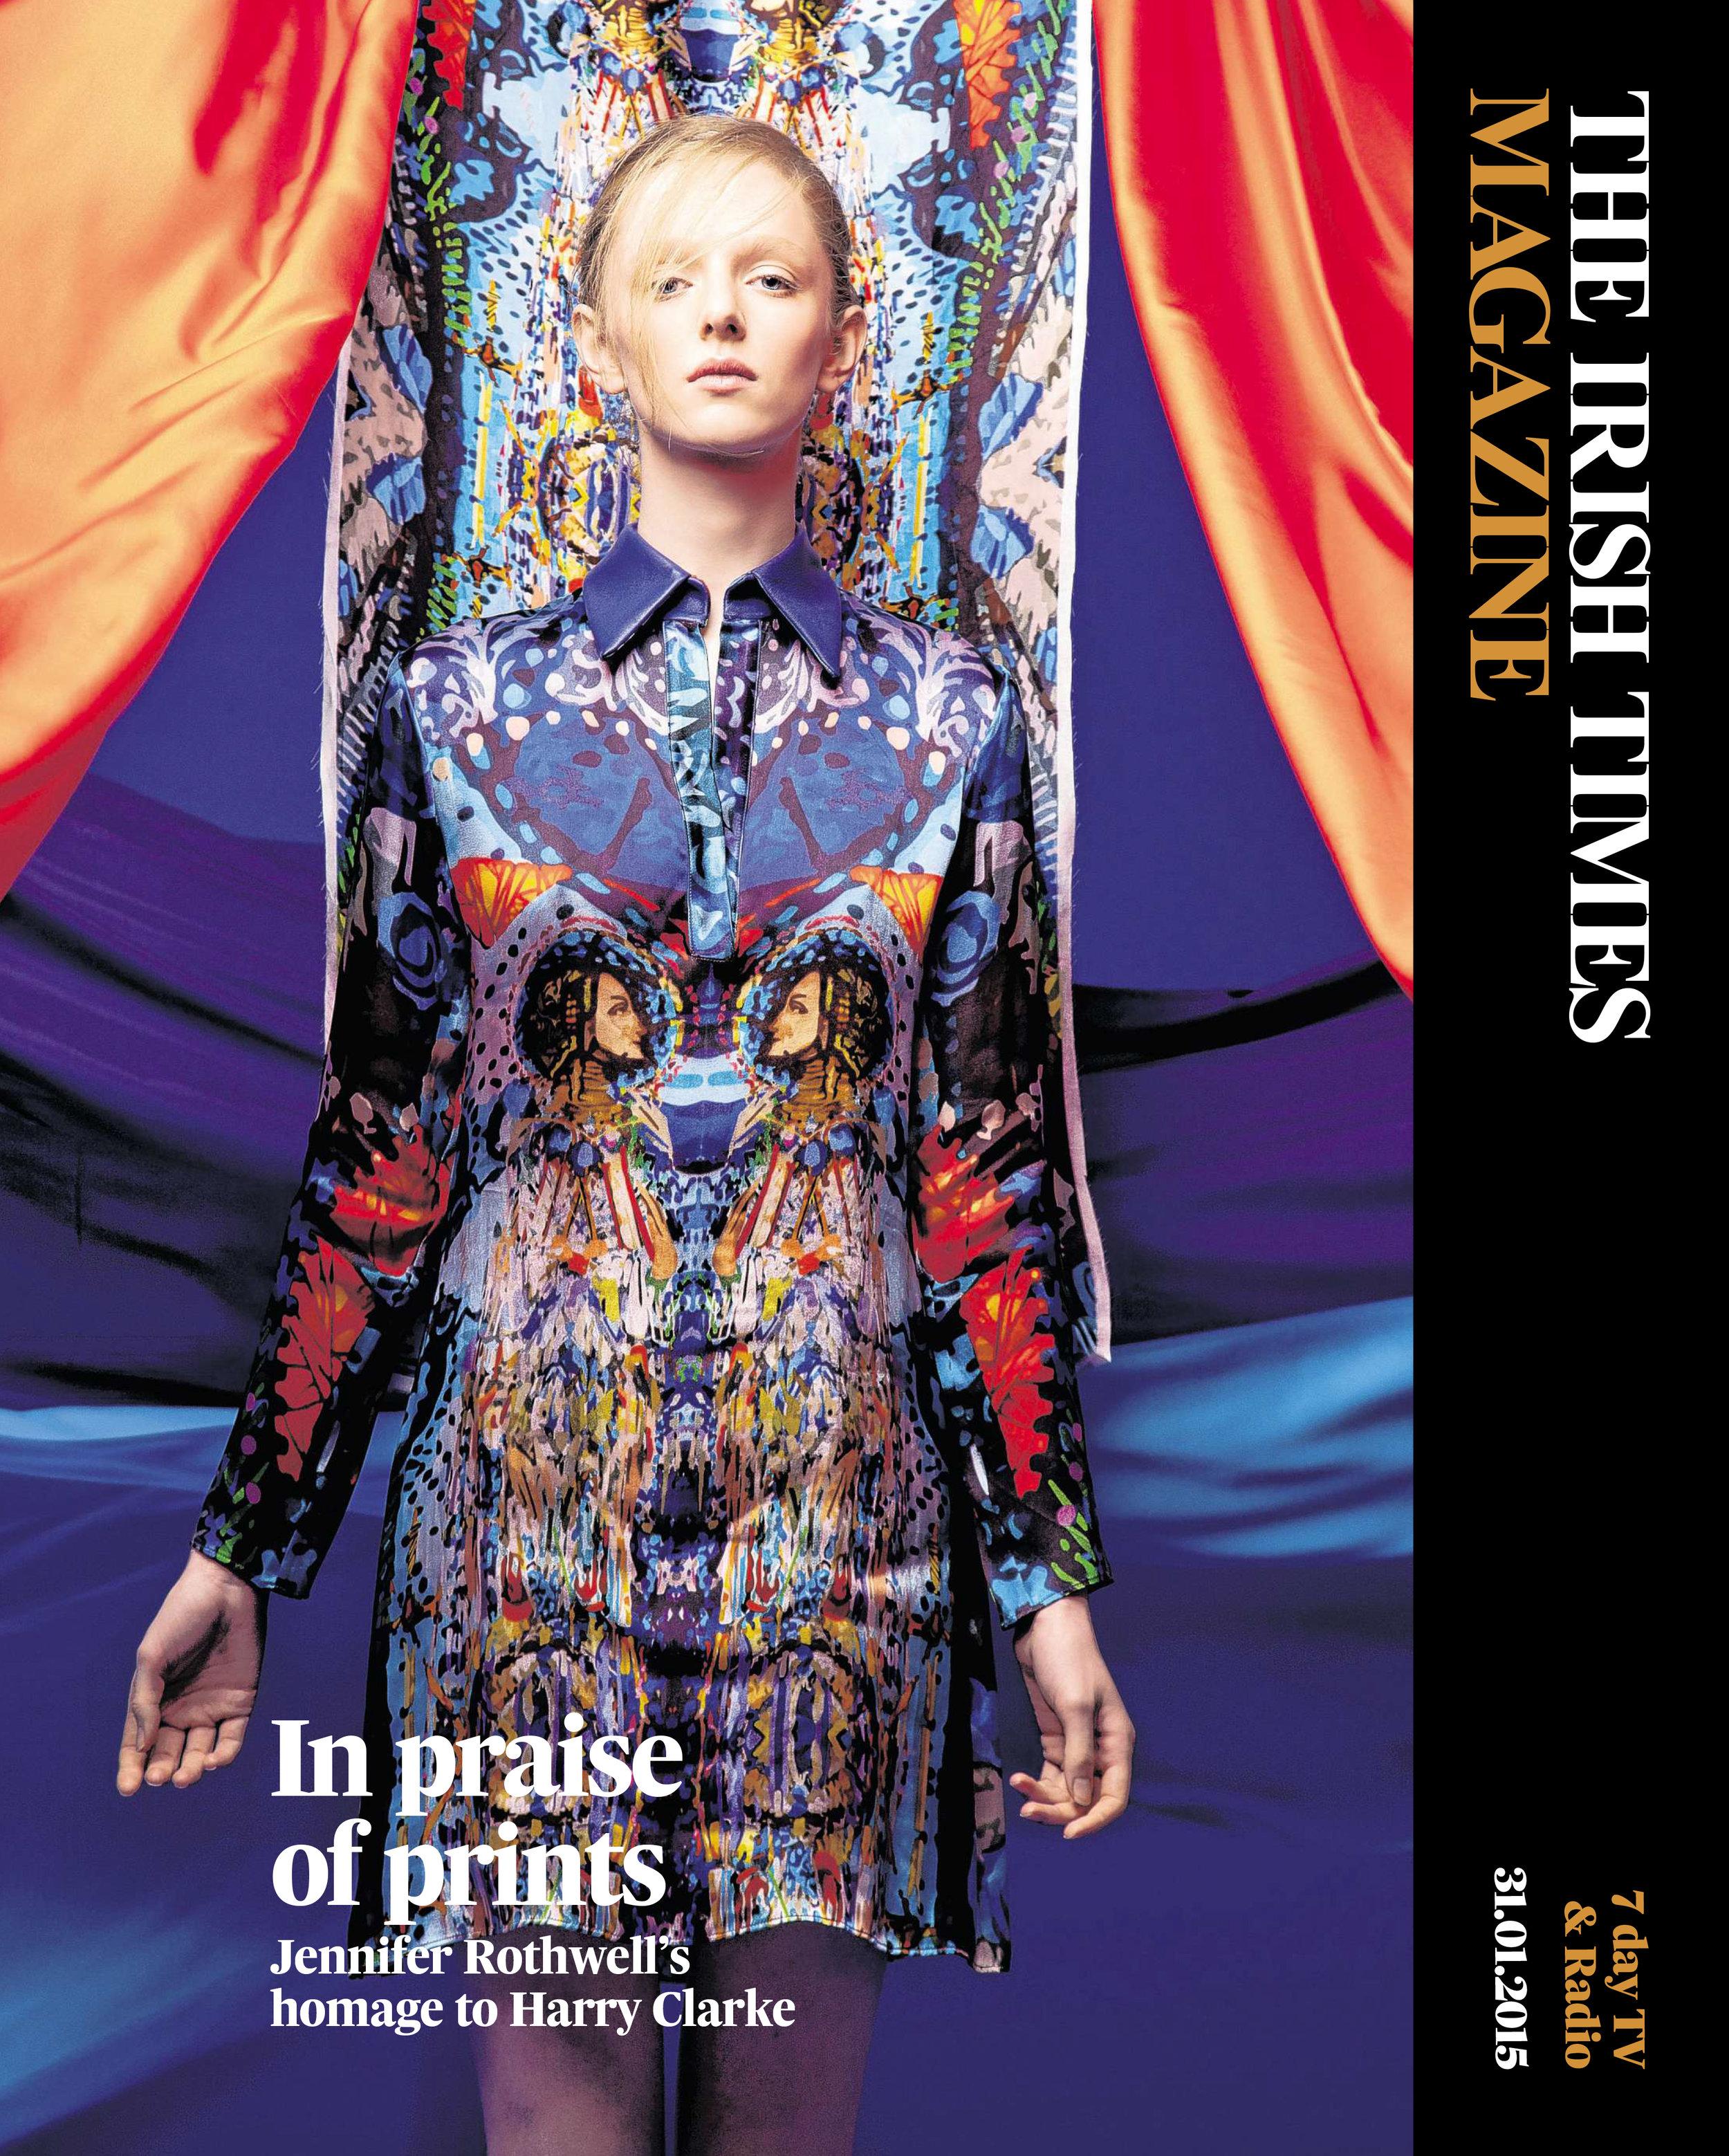 The Irish Time Magazine, February 2015